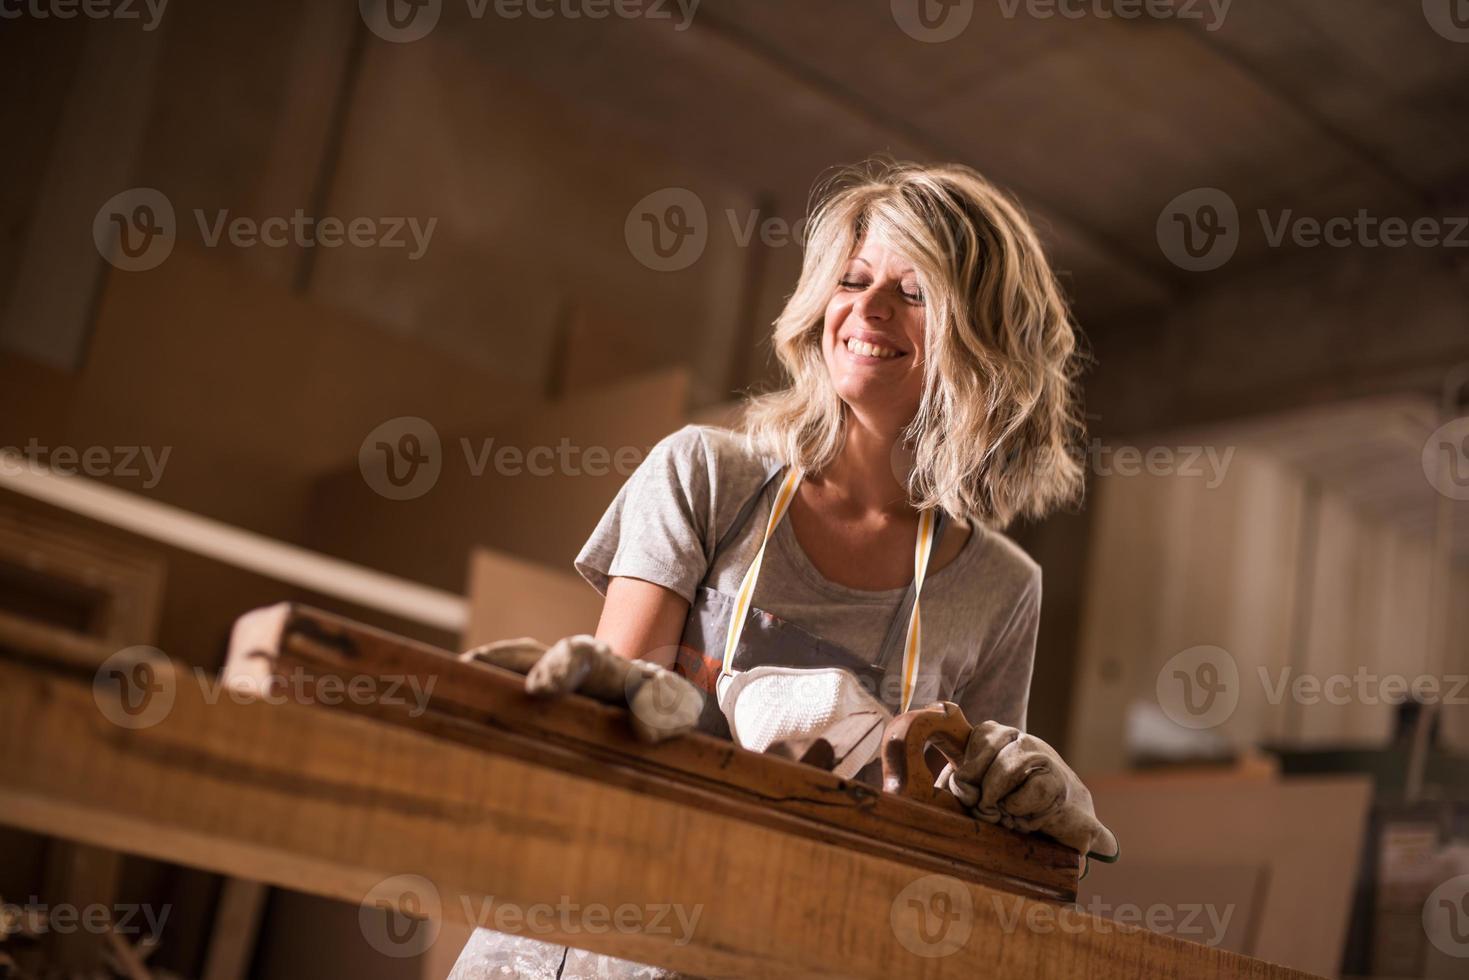 carpeentere feminino no trabalho foto